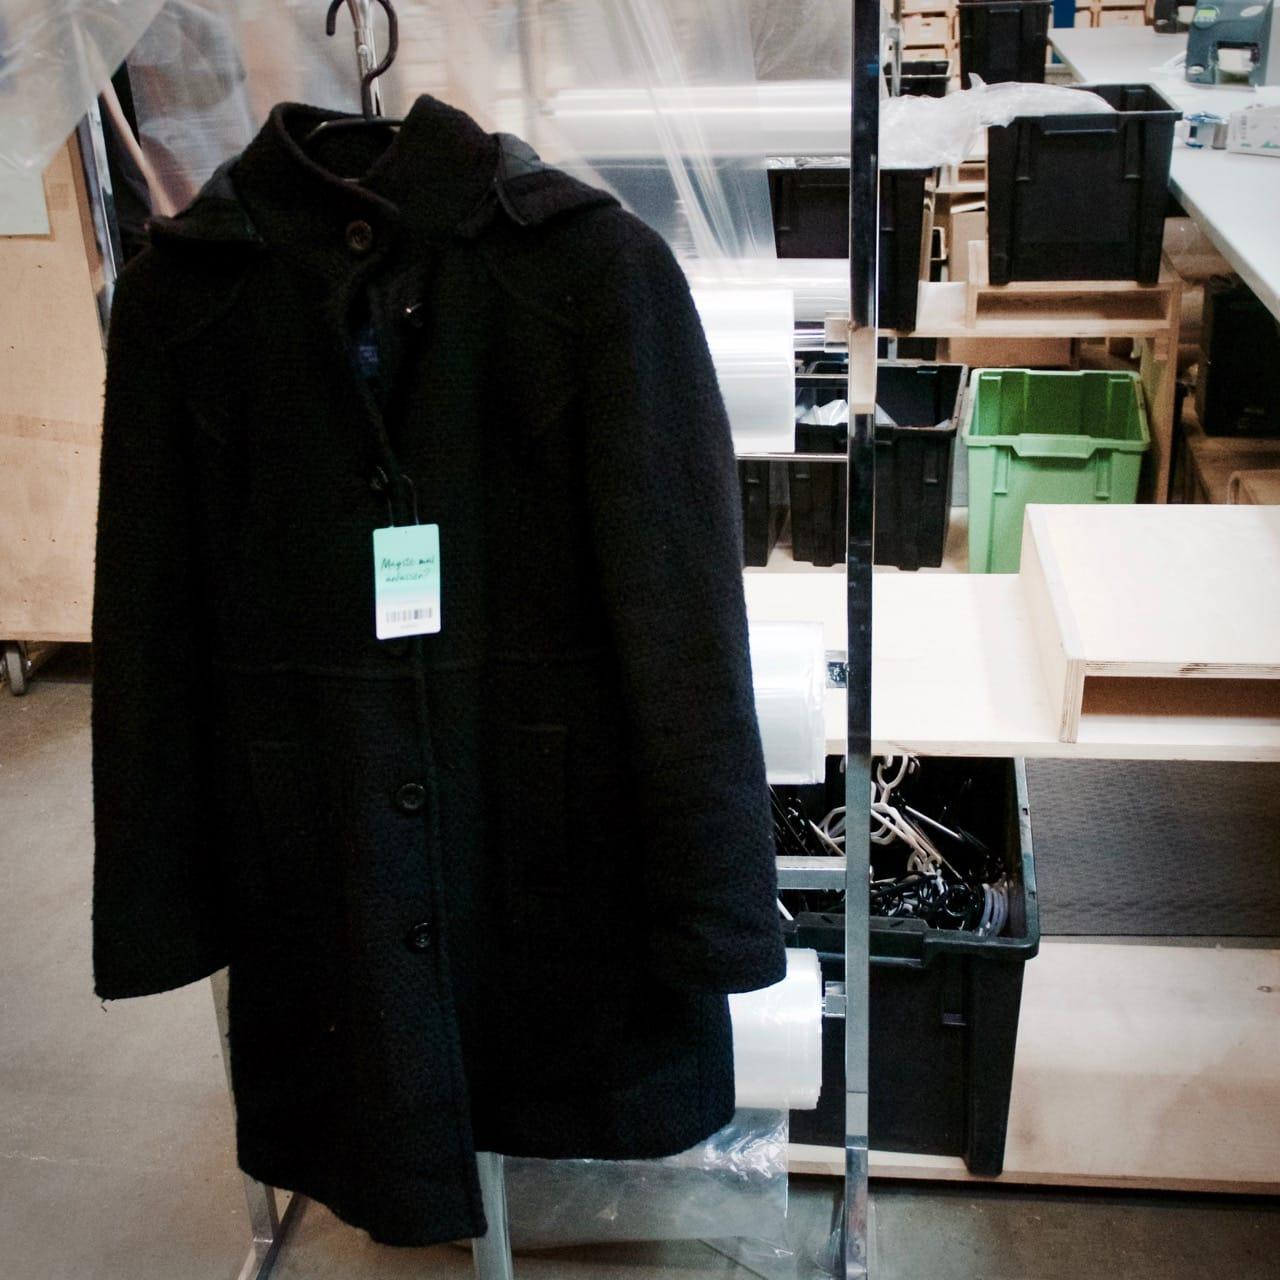 DASISTmomox fashion - Folge mir durch unser Lager 21